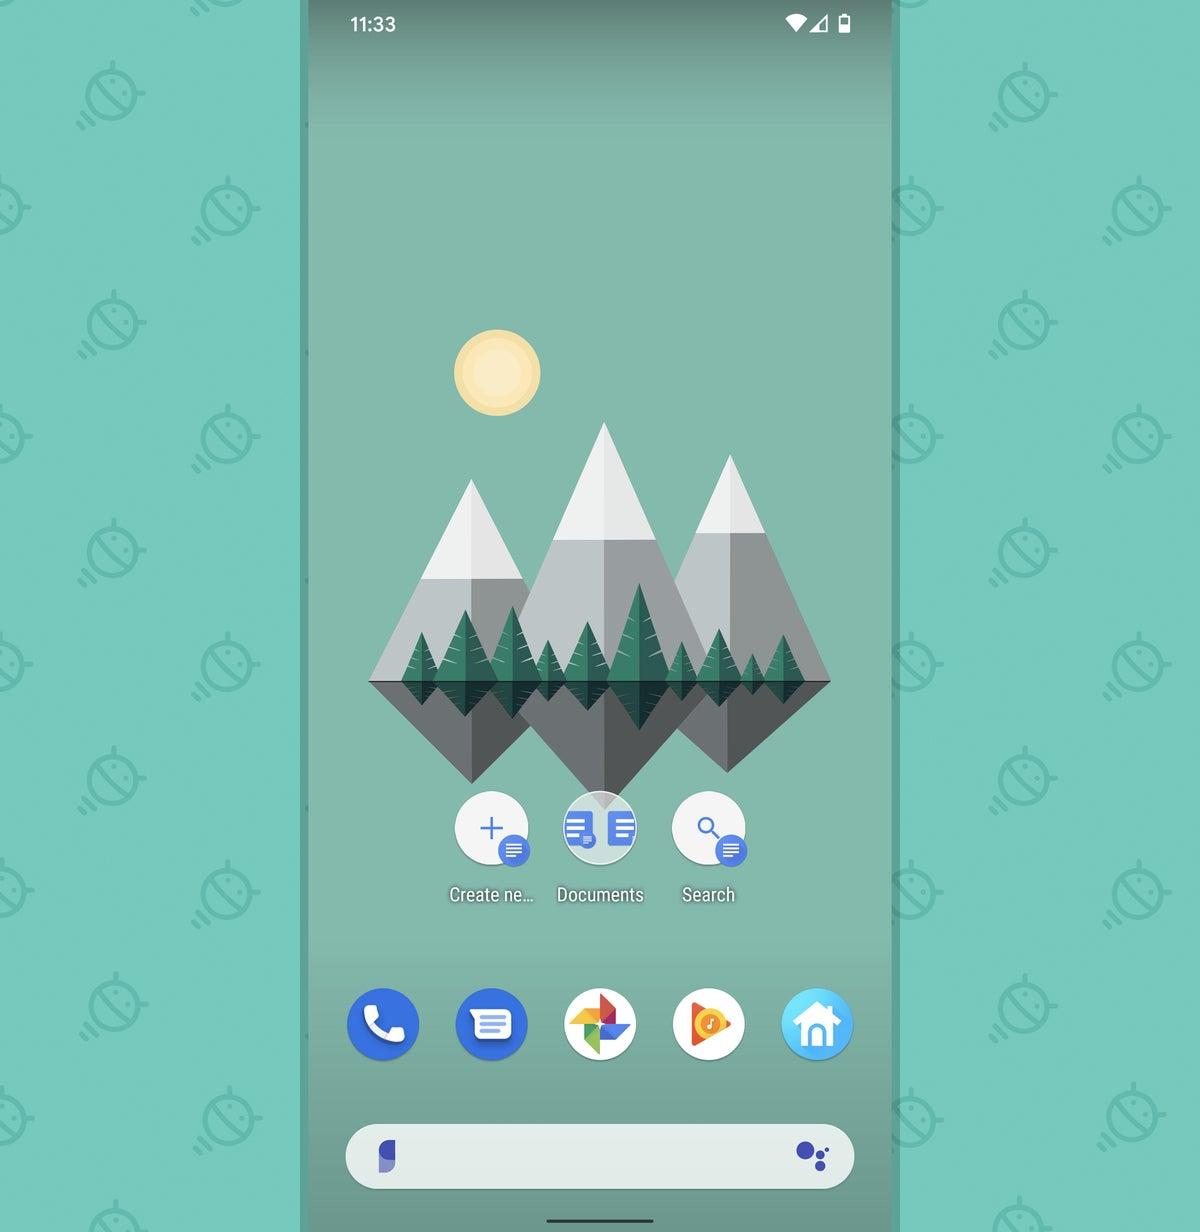 Google Docs Android: Centro de comando